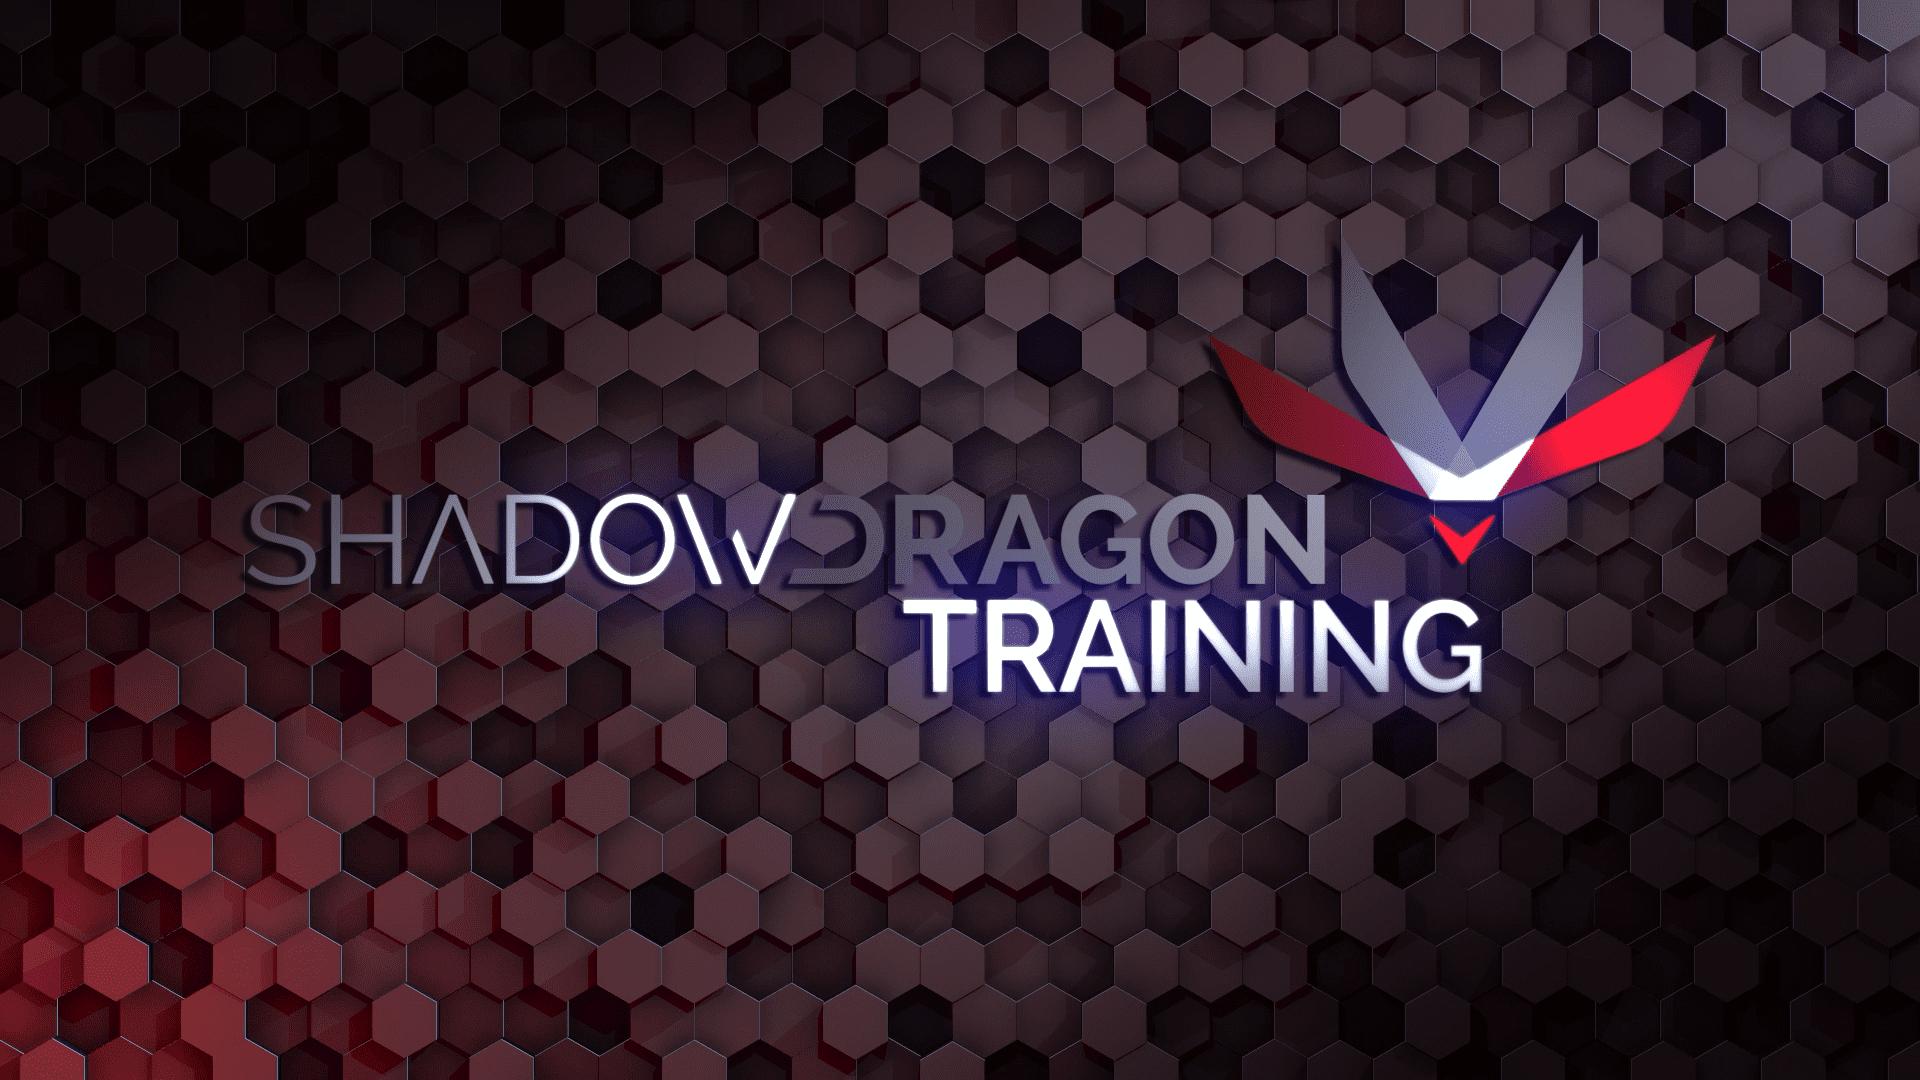 TrainingOverview